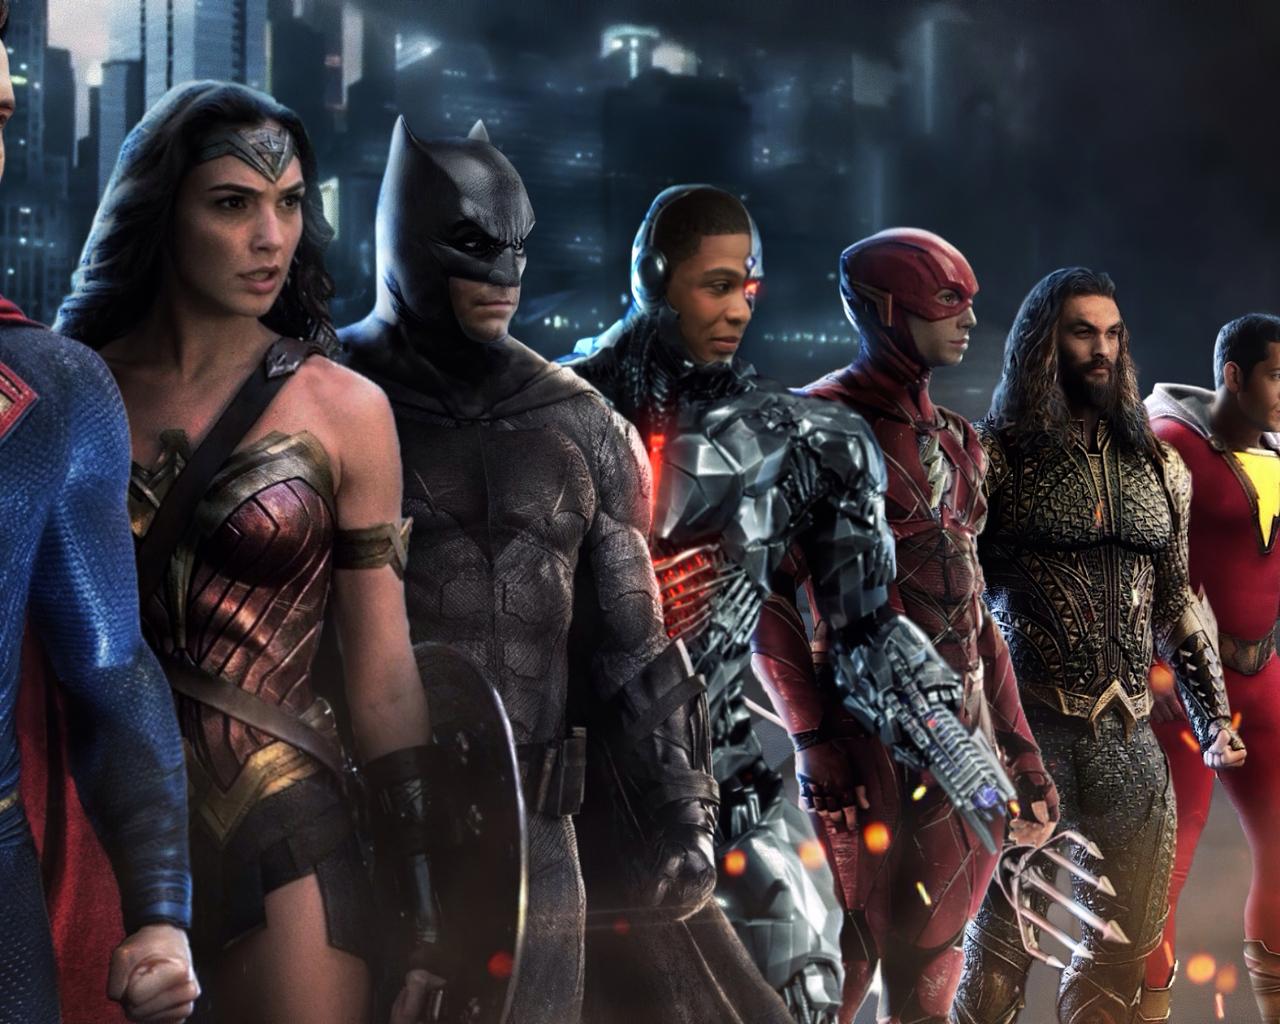 justice-league-heroes-among-ls.jpg